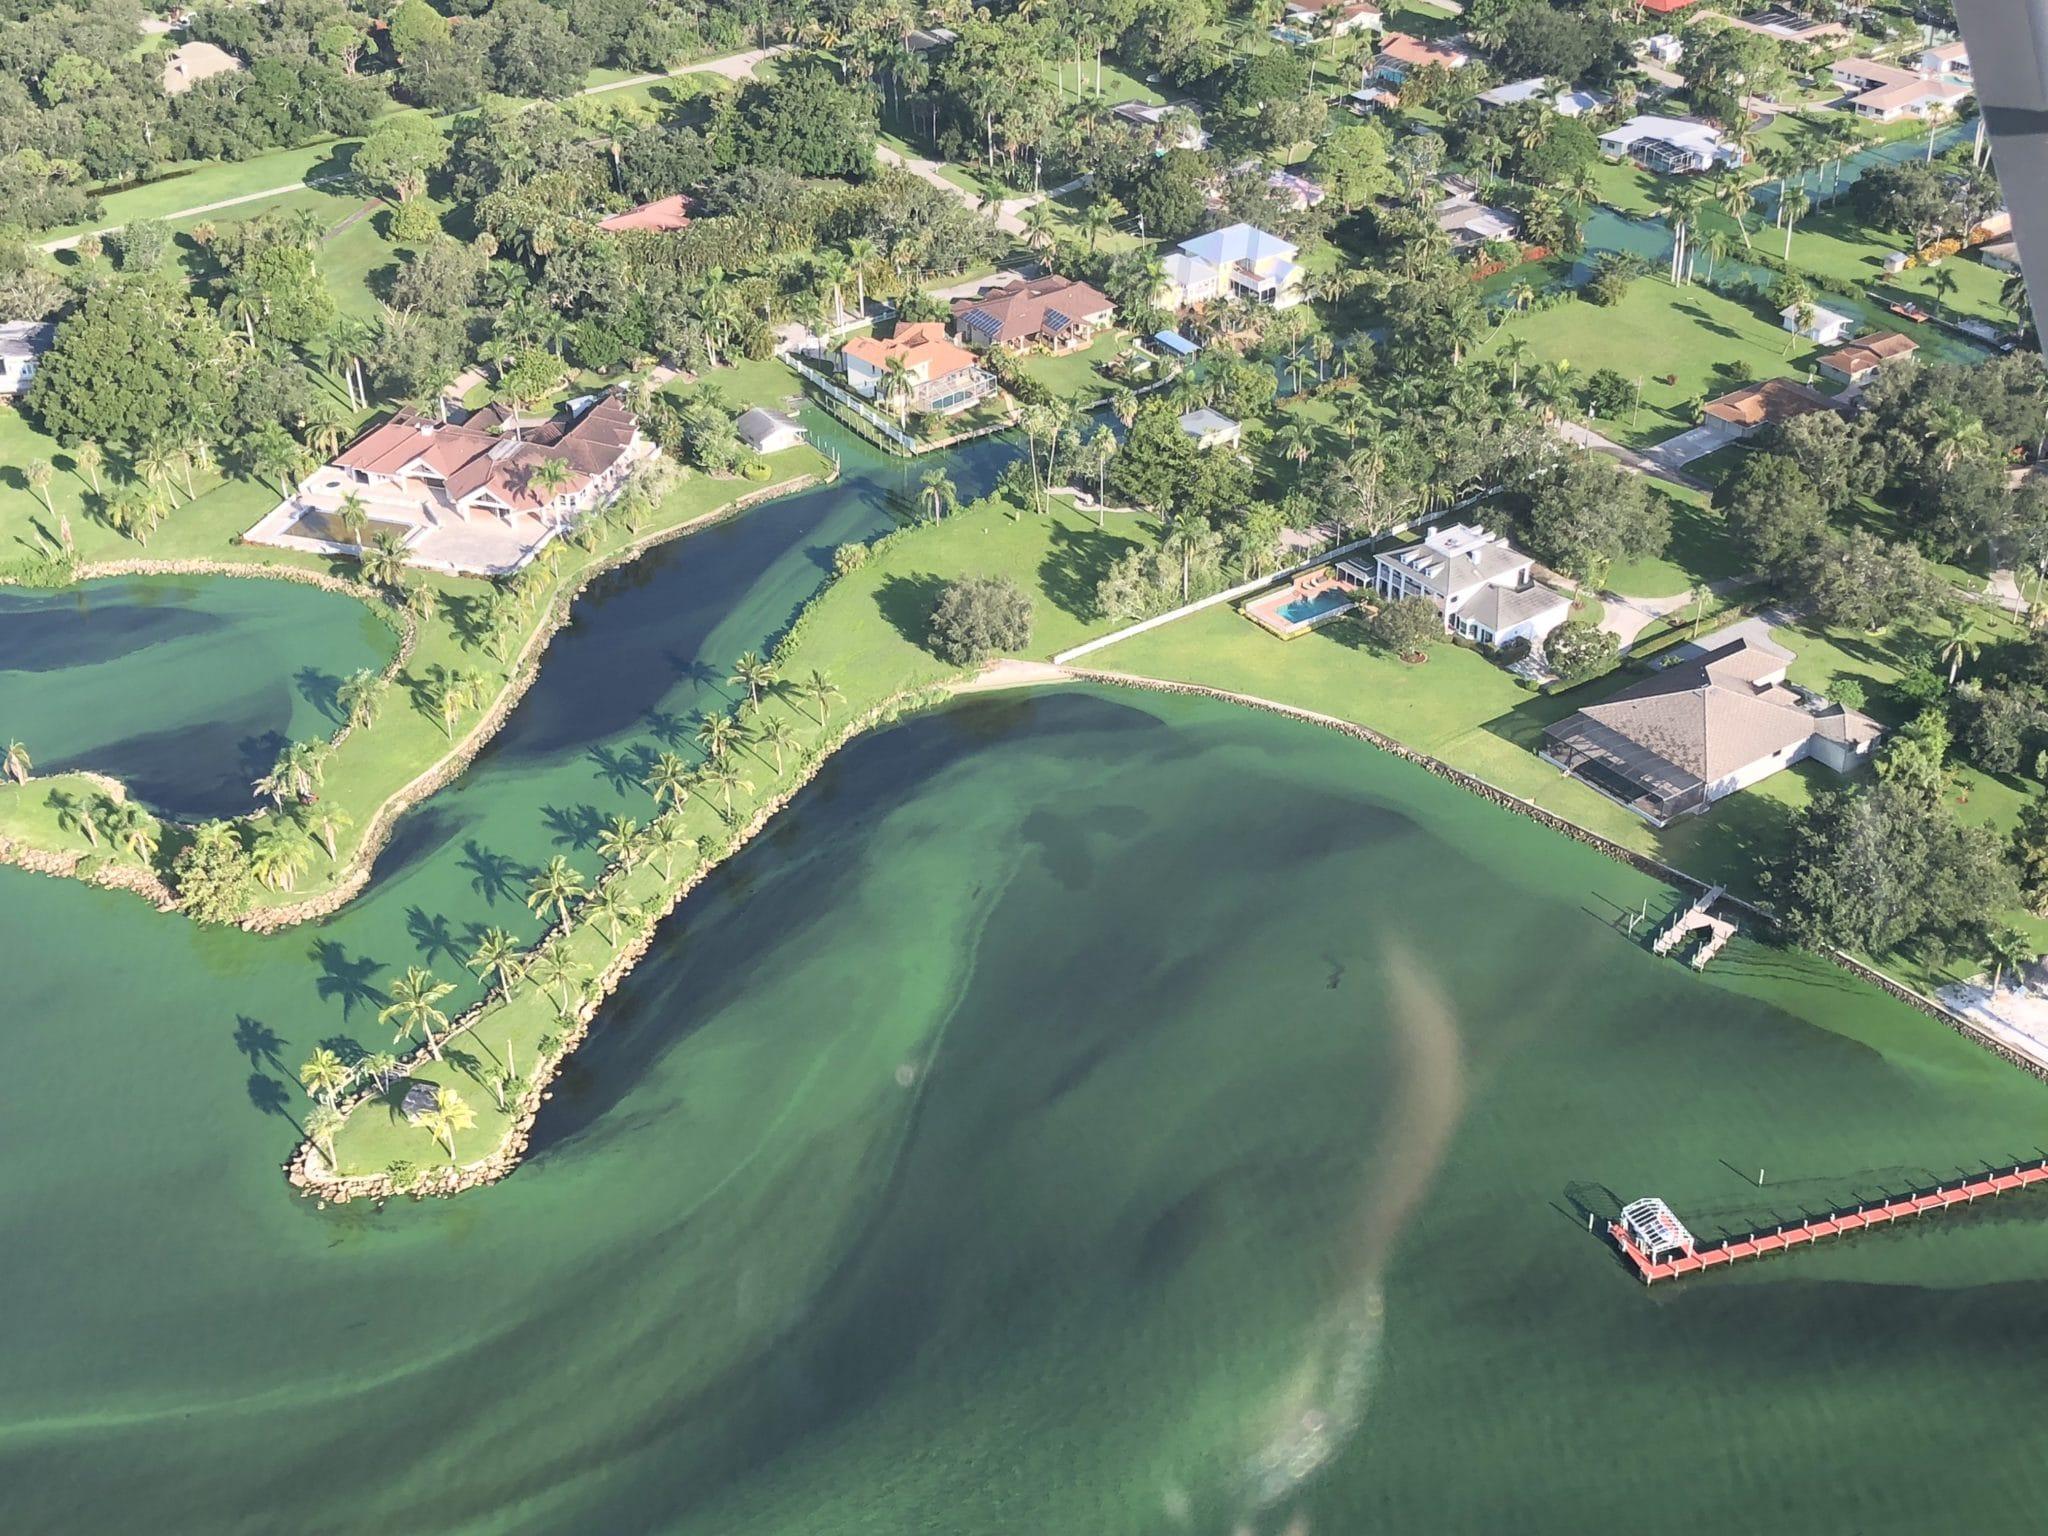 Aerial view showing algae blooms in the water